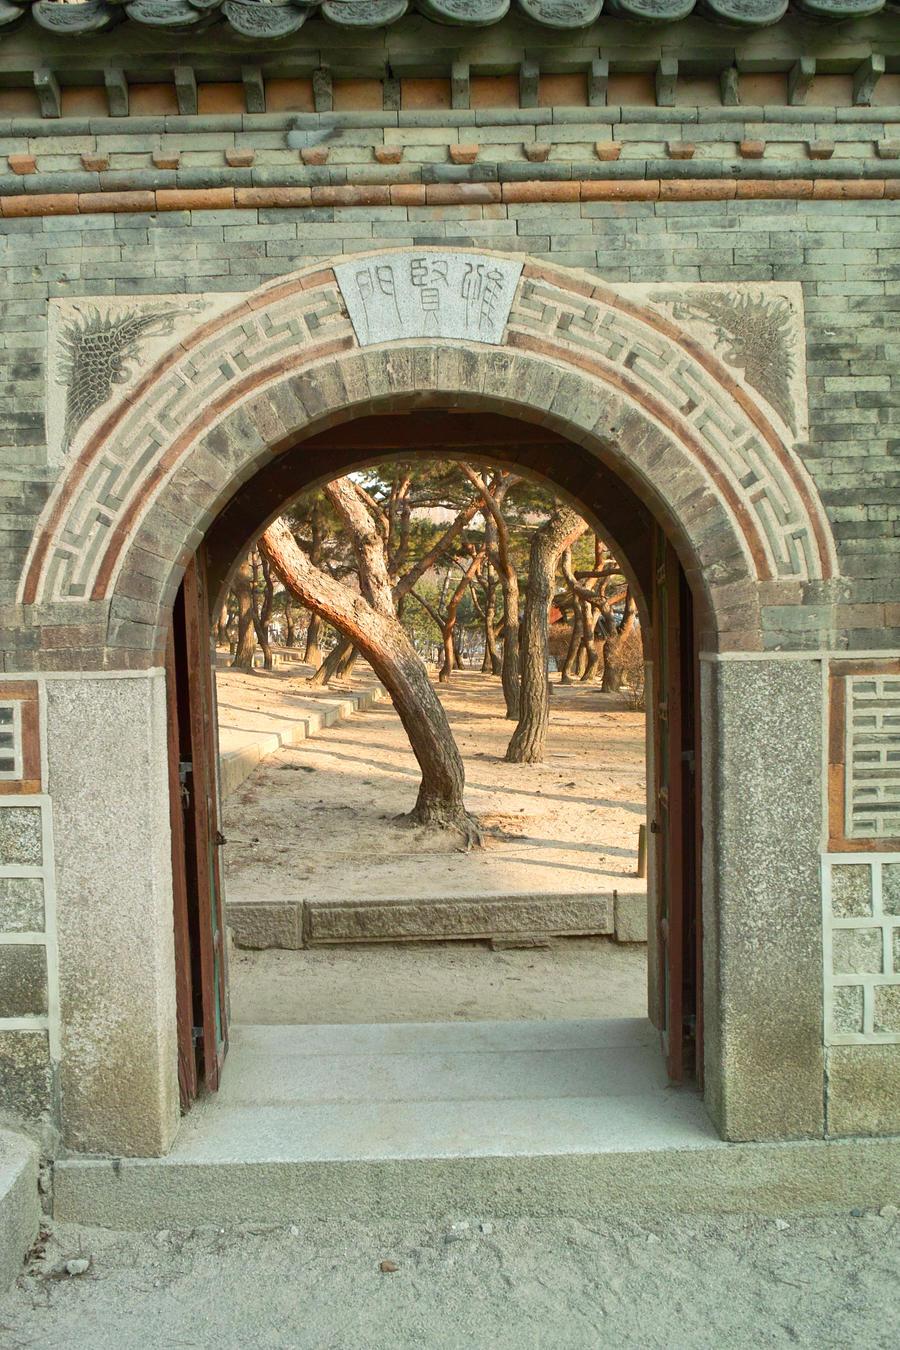 Royal Door by sanddragon Royal Door by sanddragon & Royal Door by sanddragon on DeviantArt